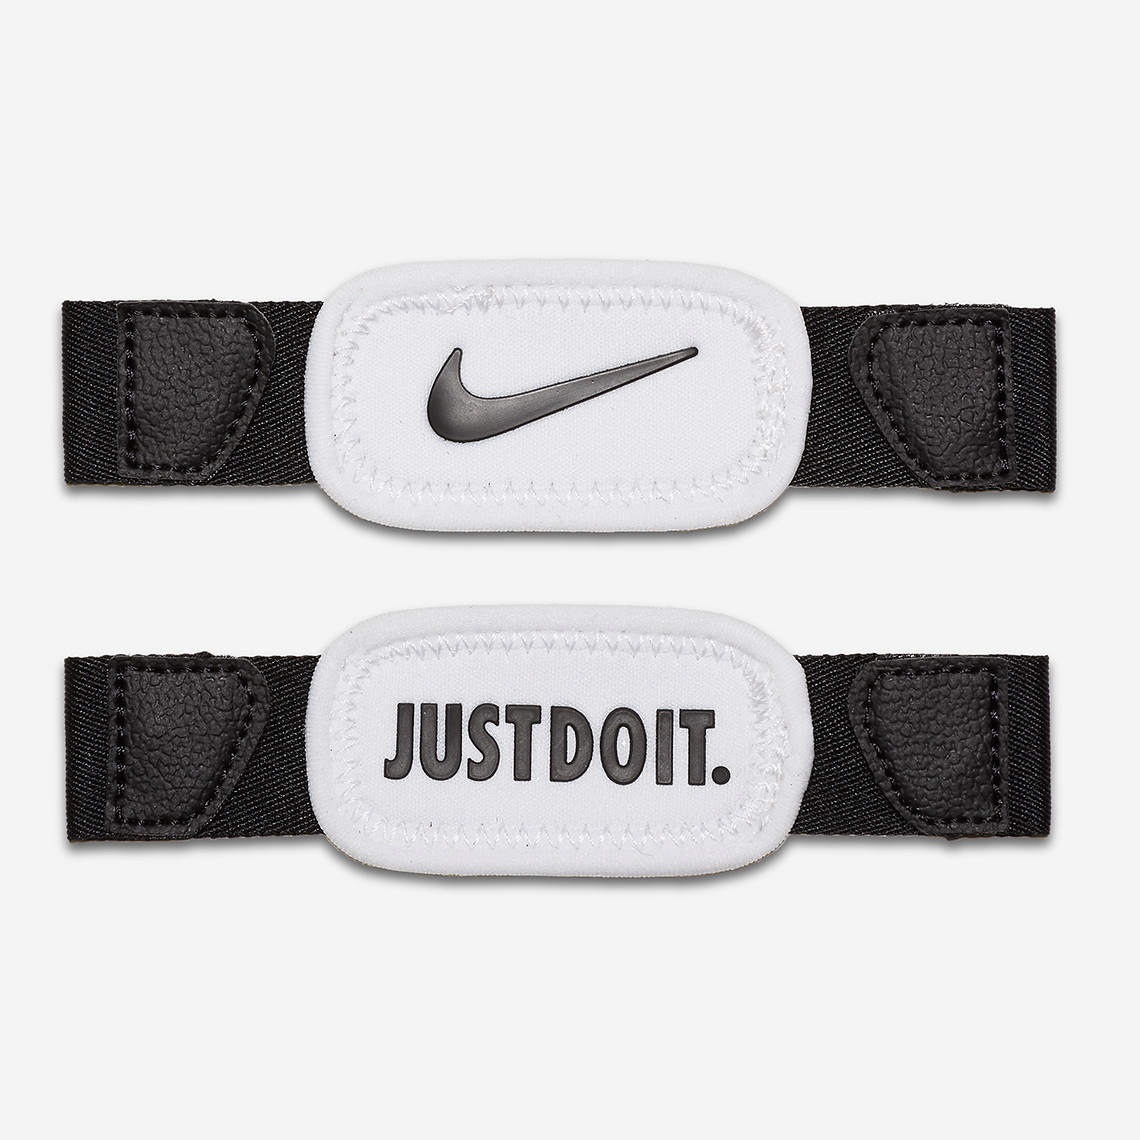 Sepatu Nike Air Huarache City 2018 Black Gum Rilis 2018